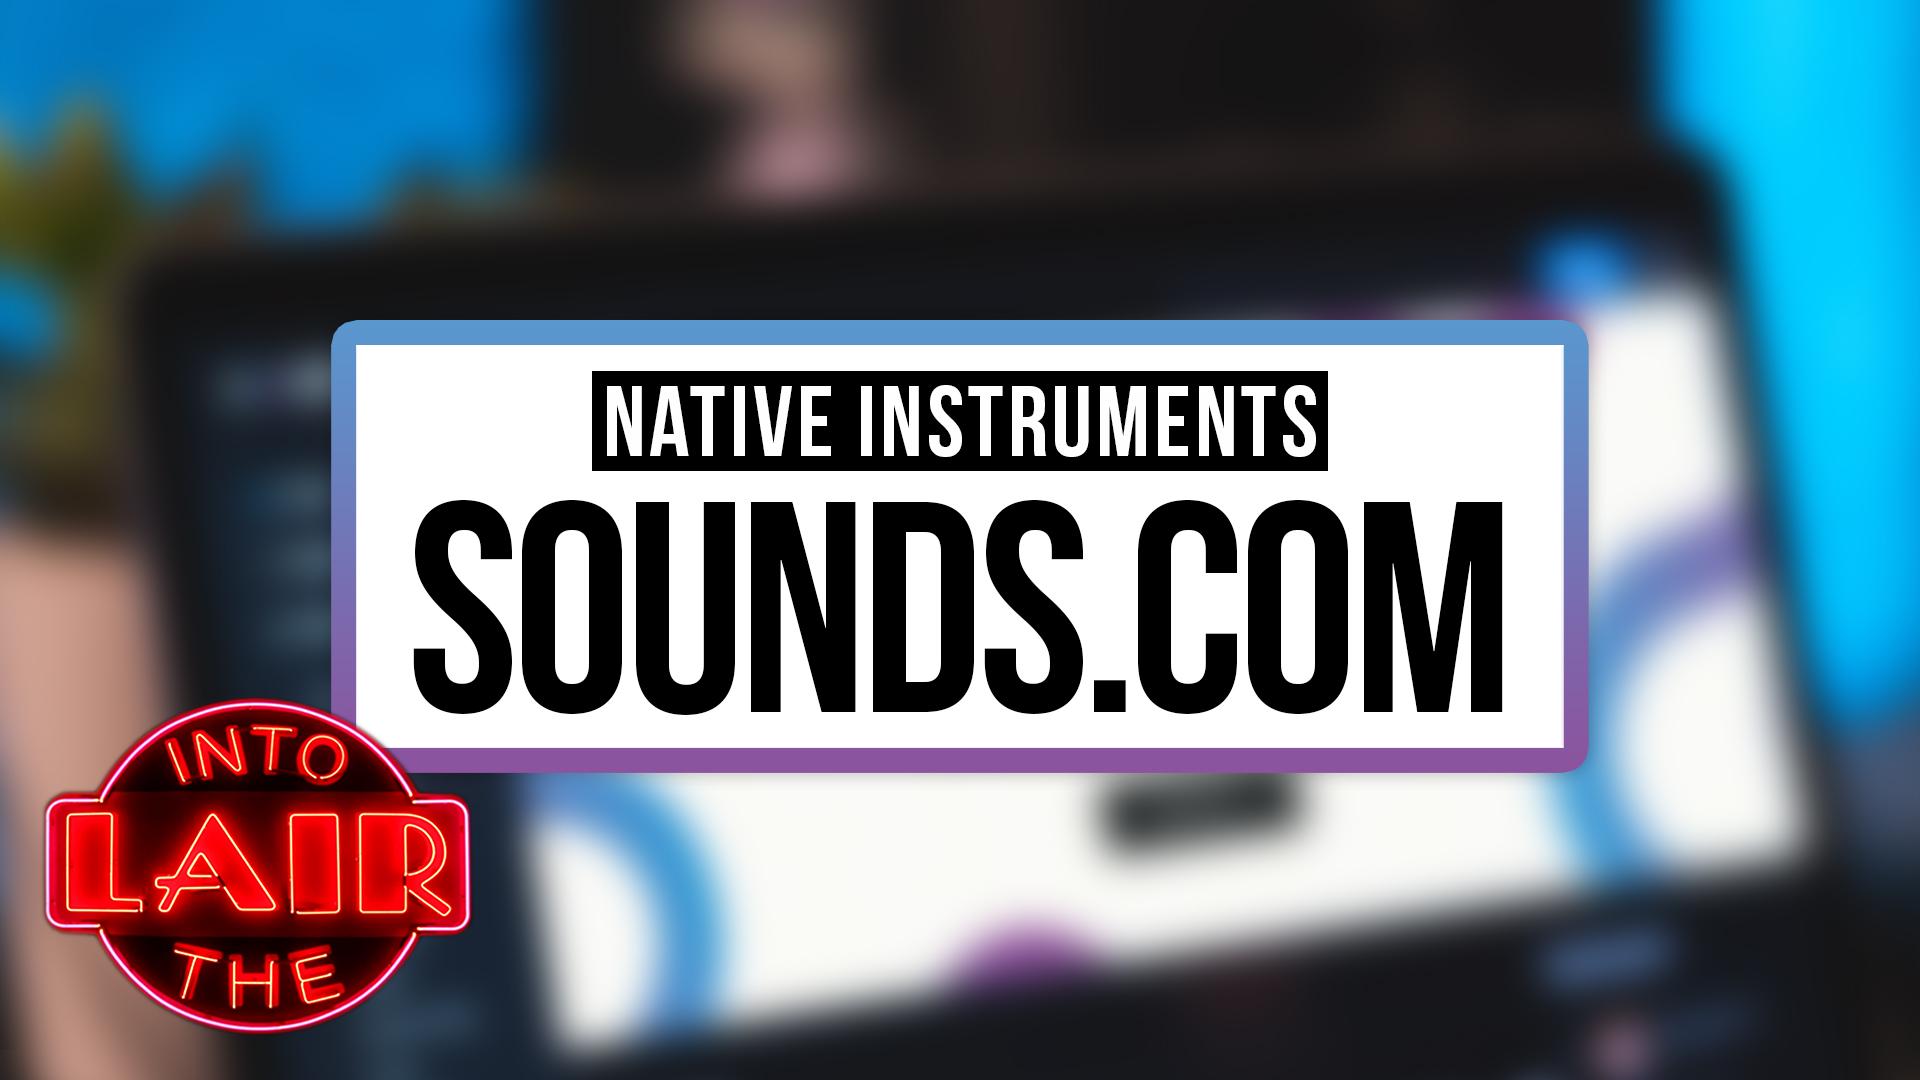 Native Instruments Sounds.com